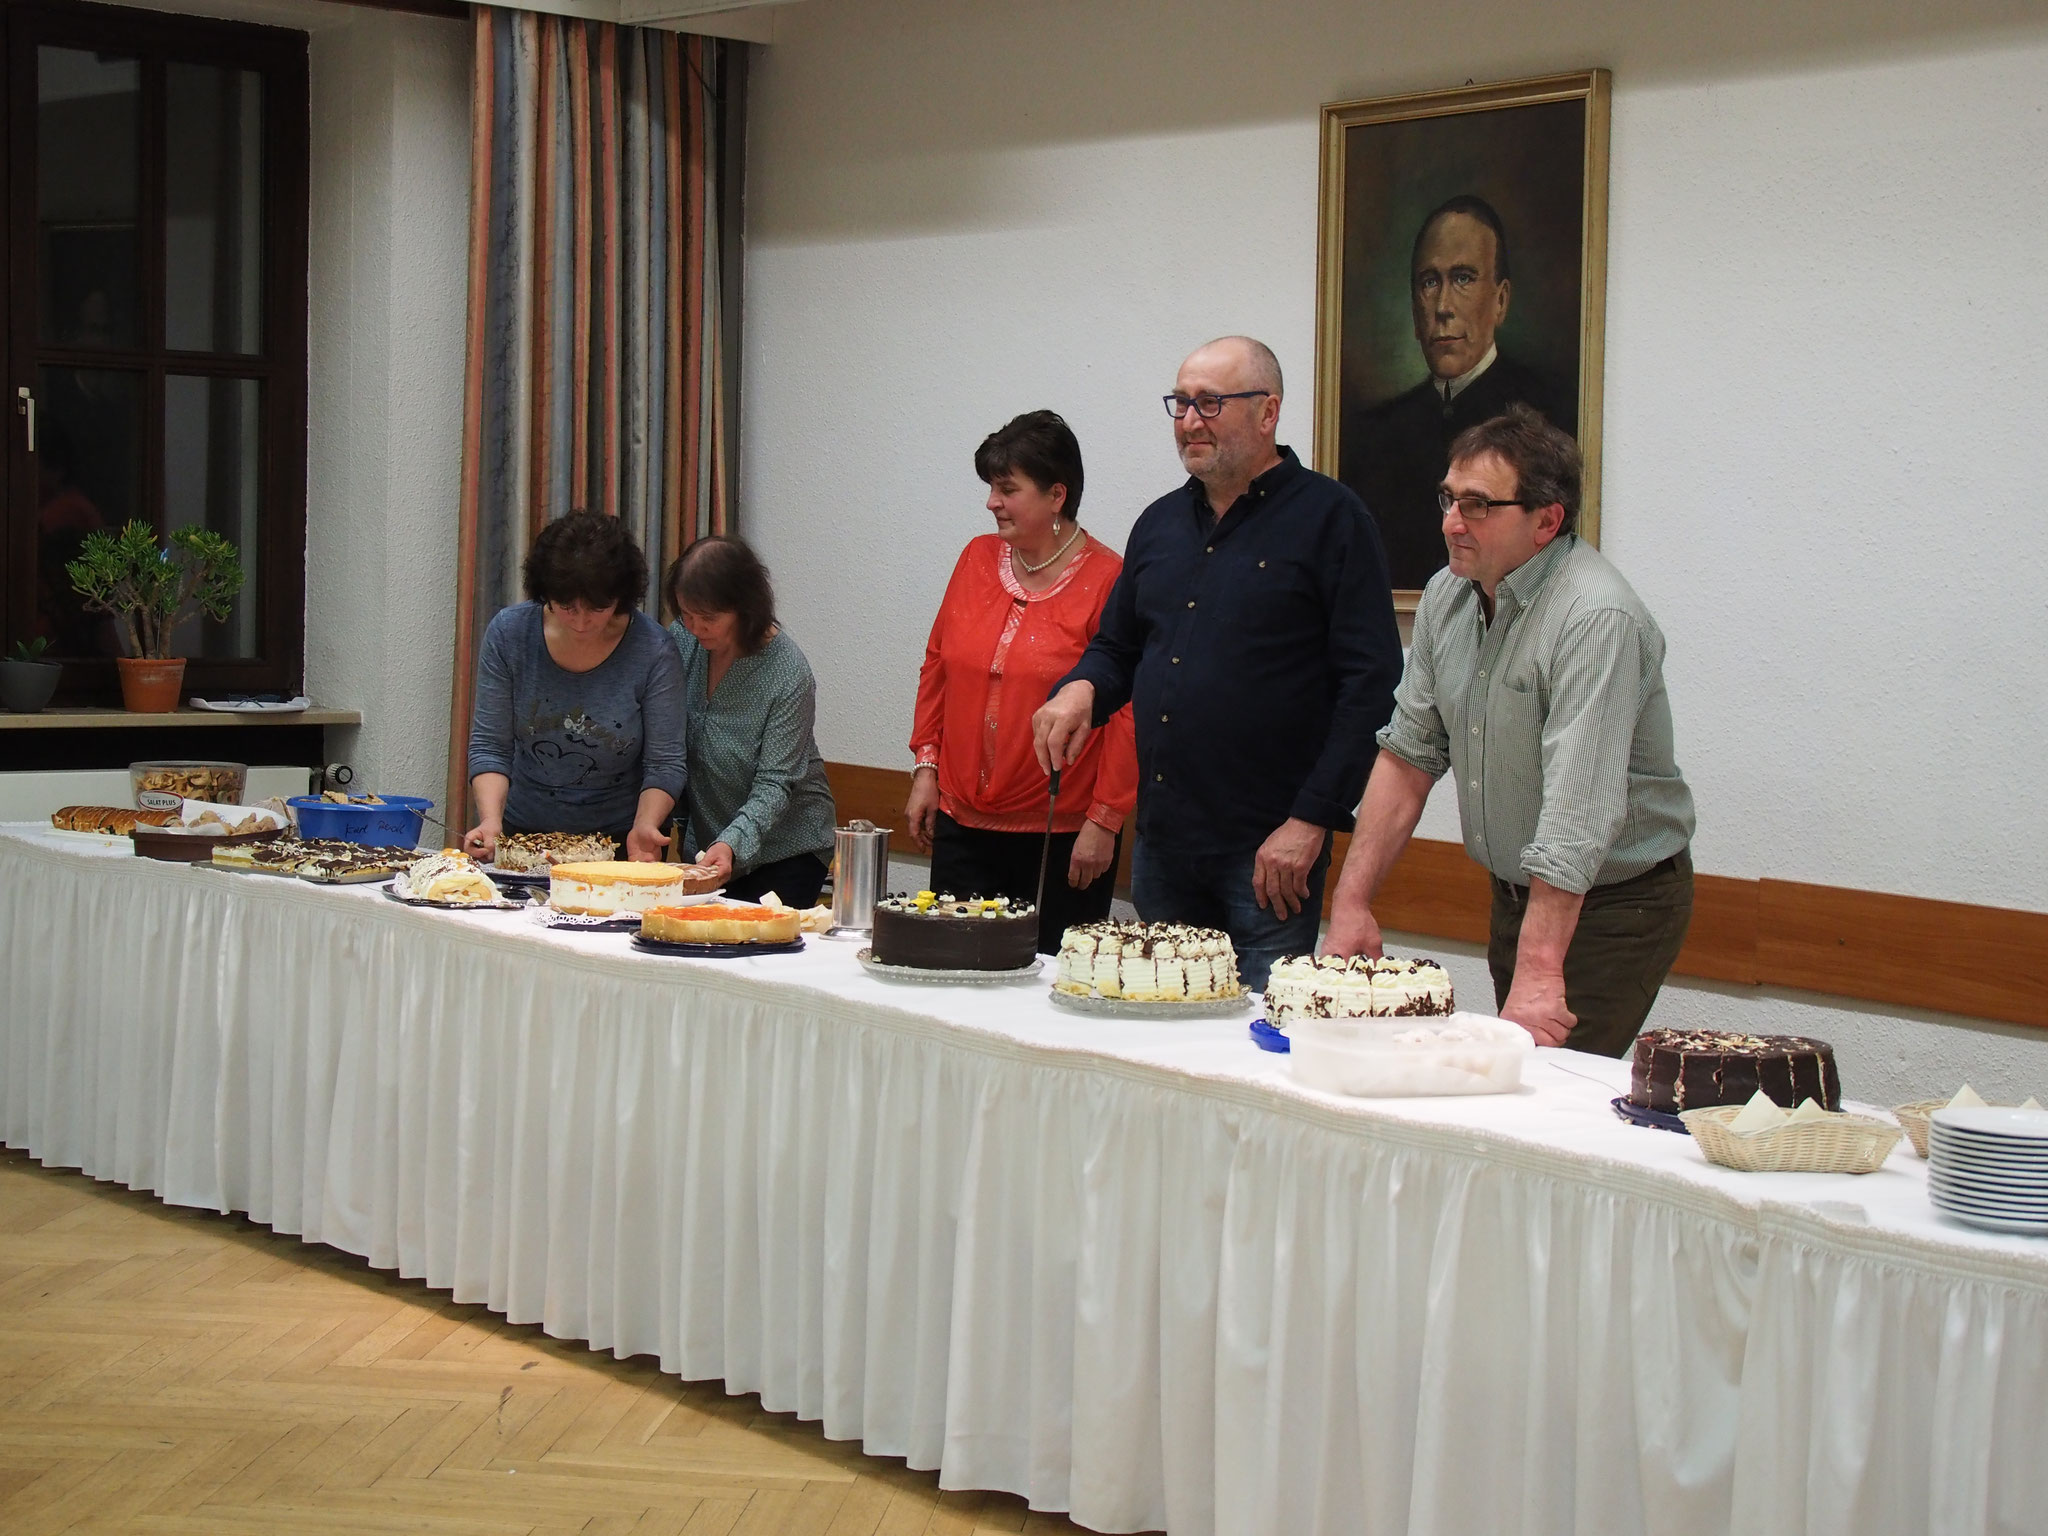 Kuchen-Buffet- Teil der Vorstandschaft